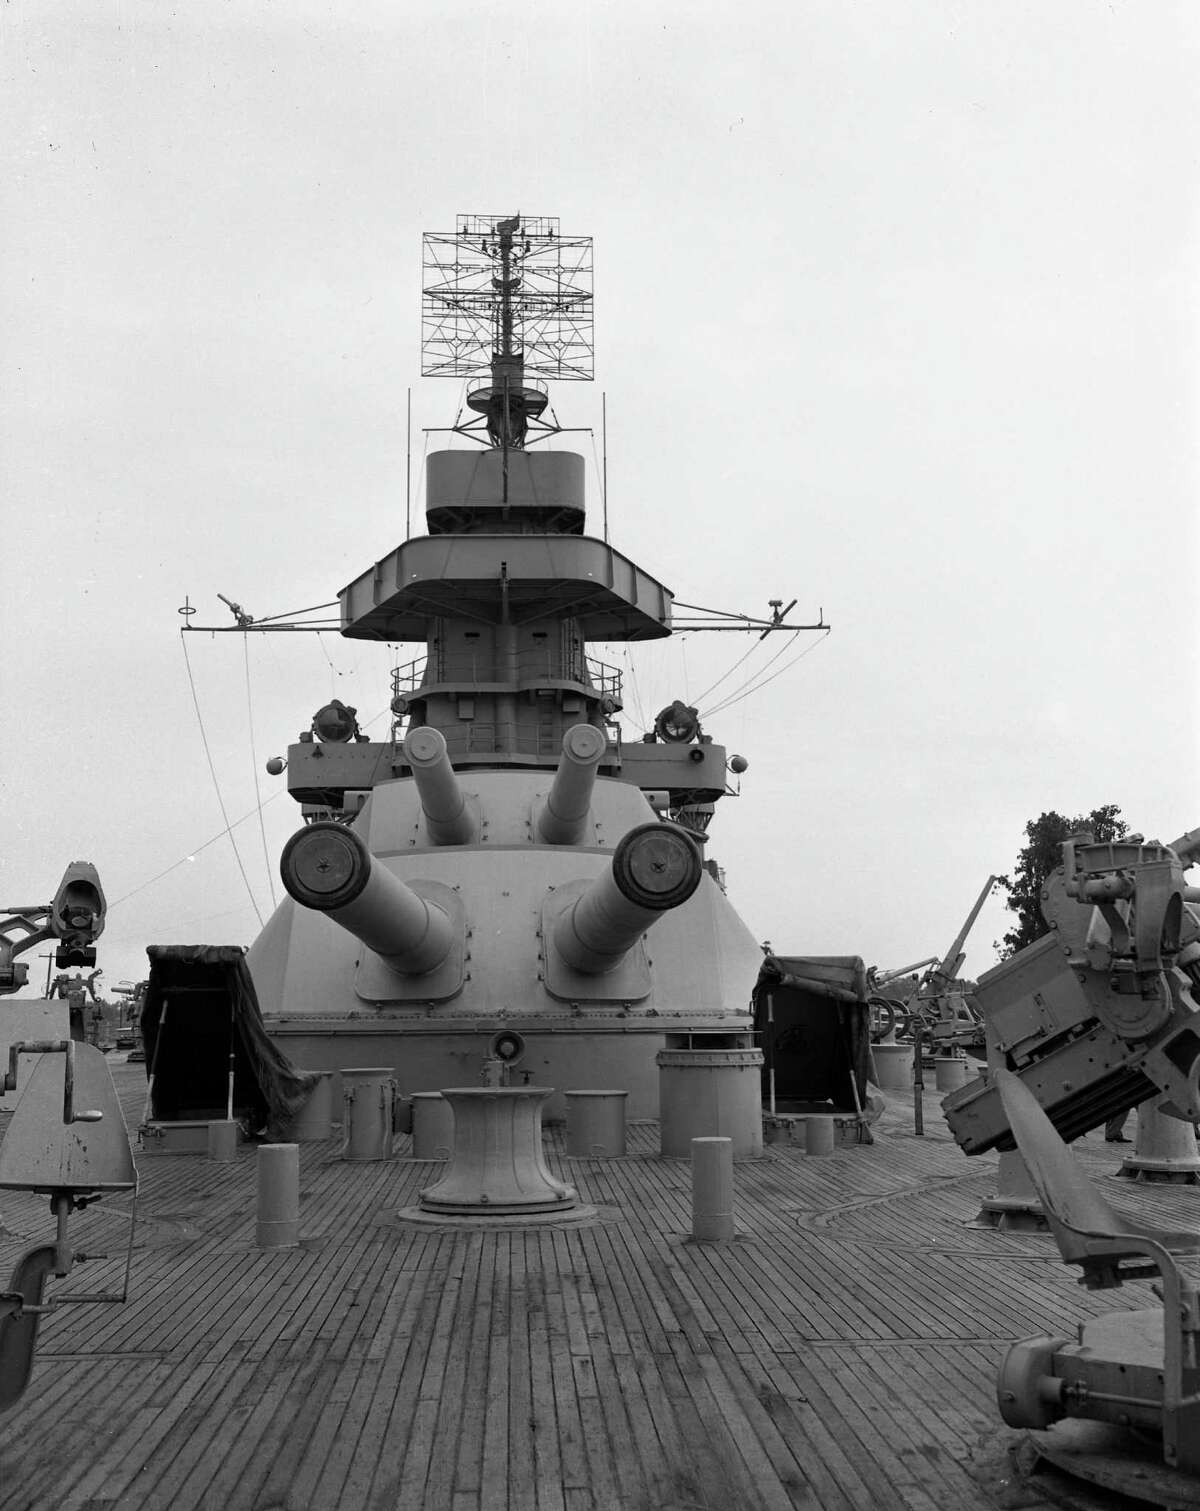 The Battleship Texas has been docked at the San Jacinto Battleground site since 1948.